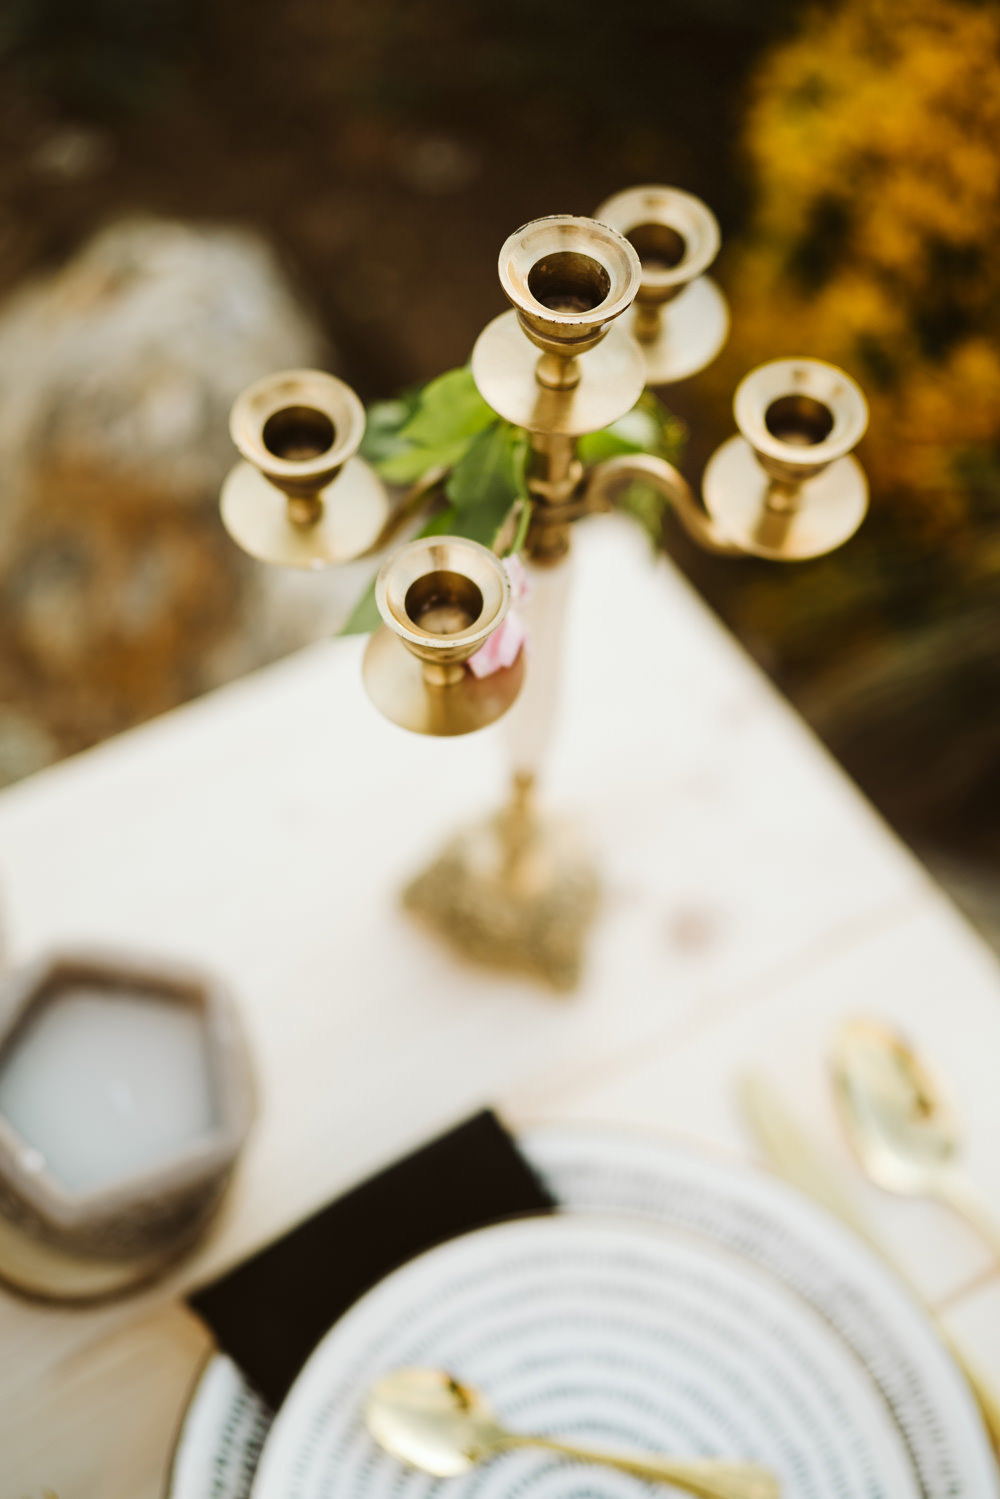 Candlestick Table Decor Clifftop Portugal Wedding Ideas John Barwood Photography